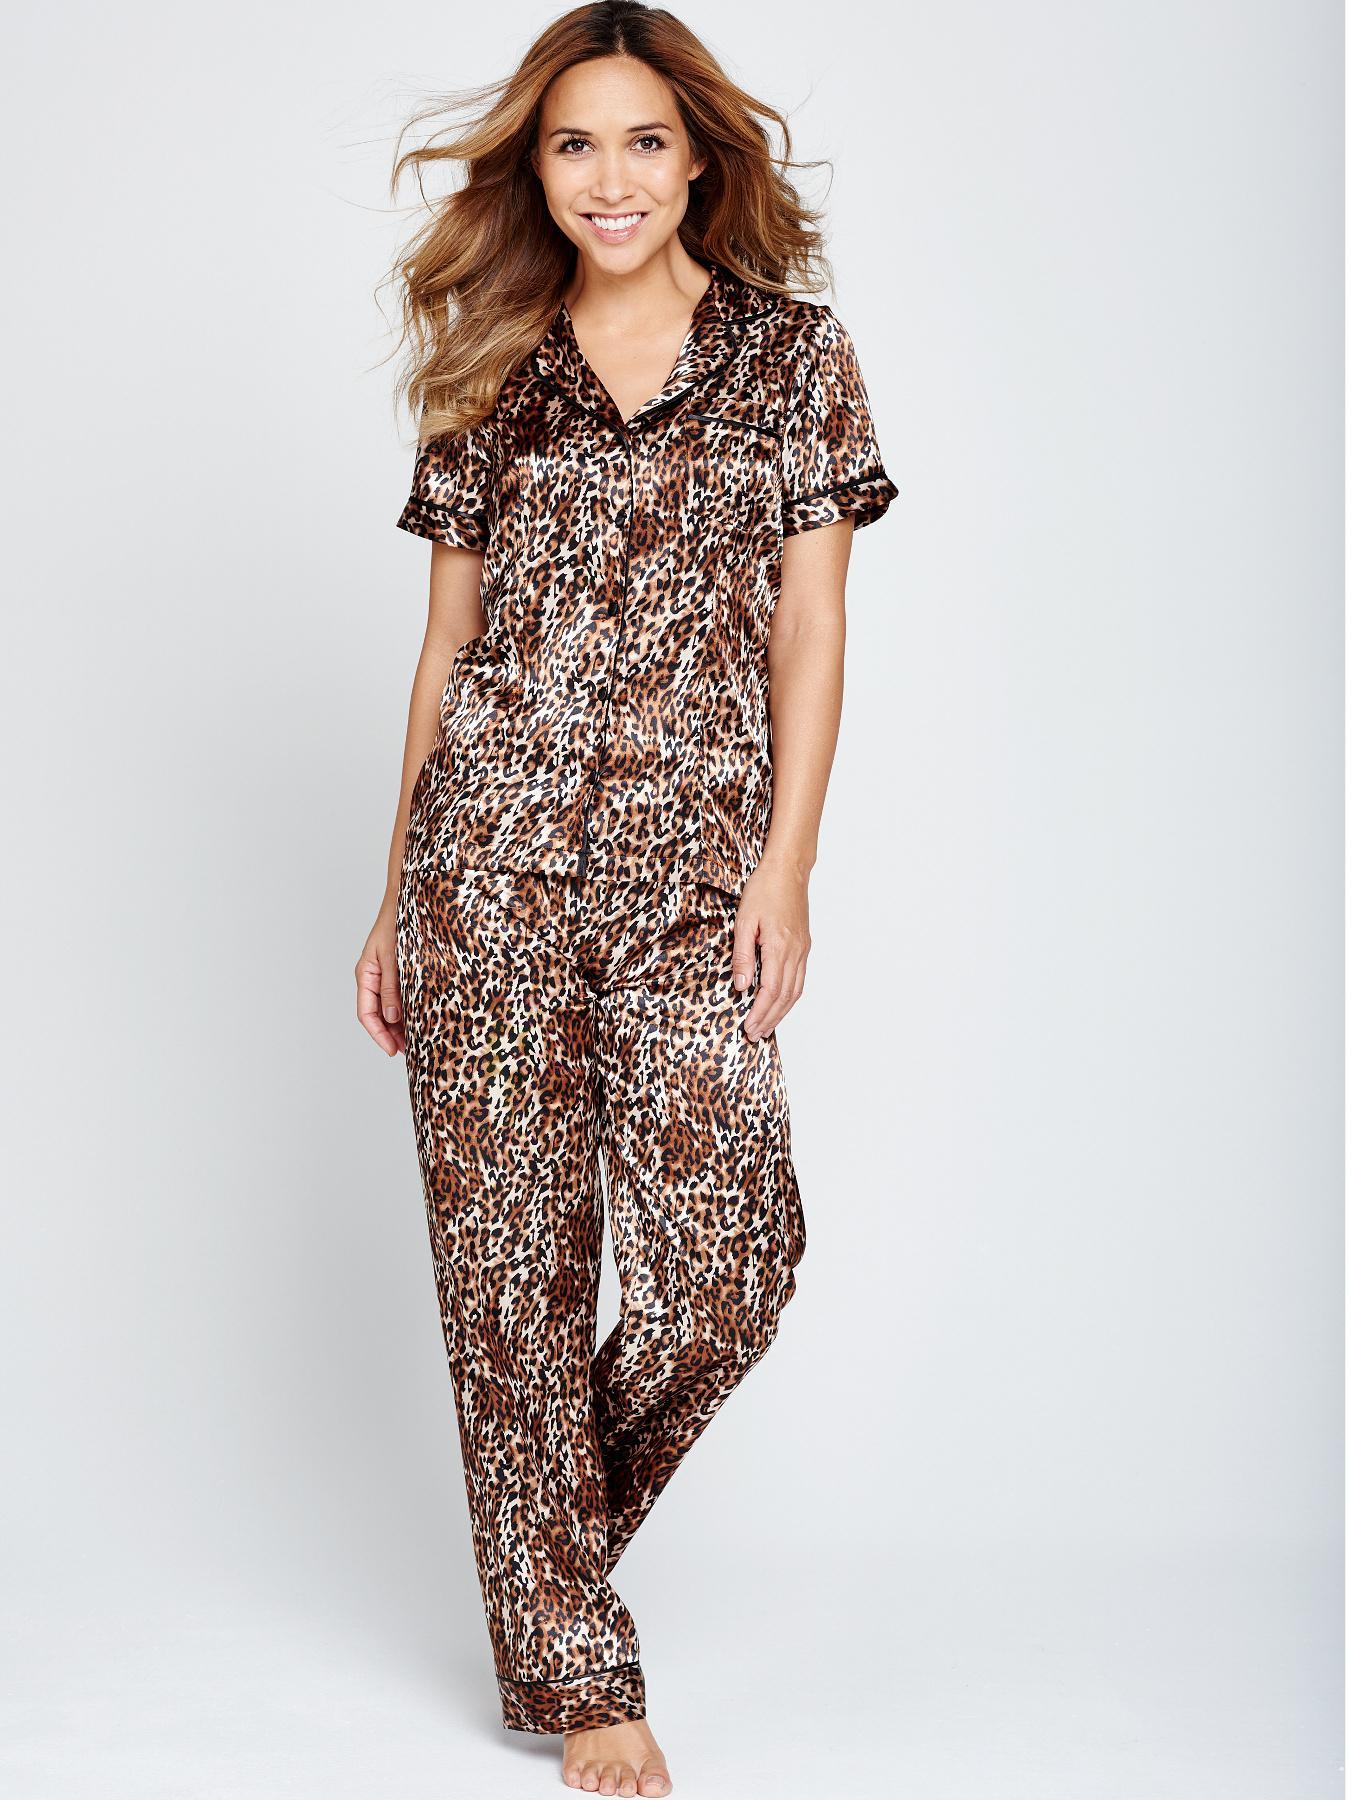 Myleene Klass Leopard Print Pyjamas - Black, Black